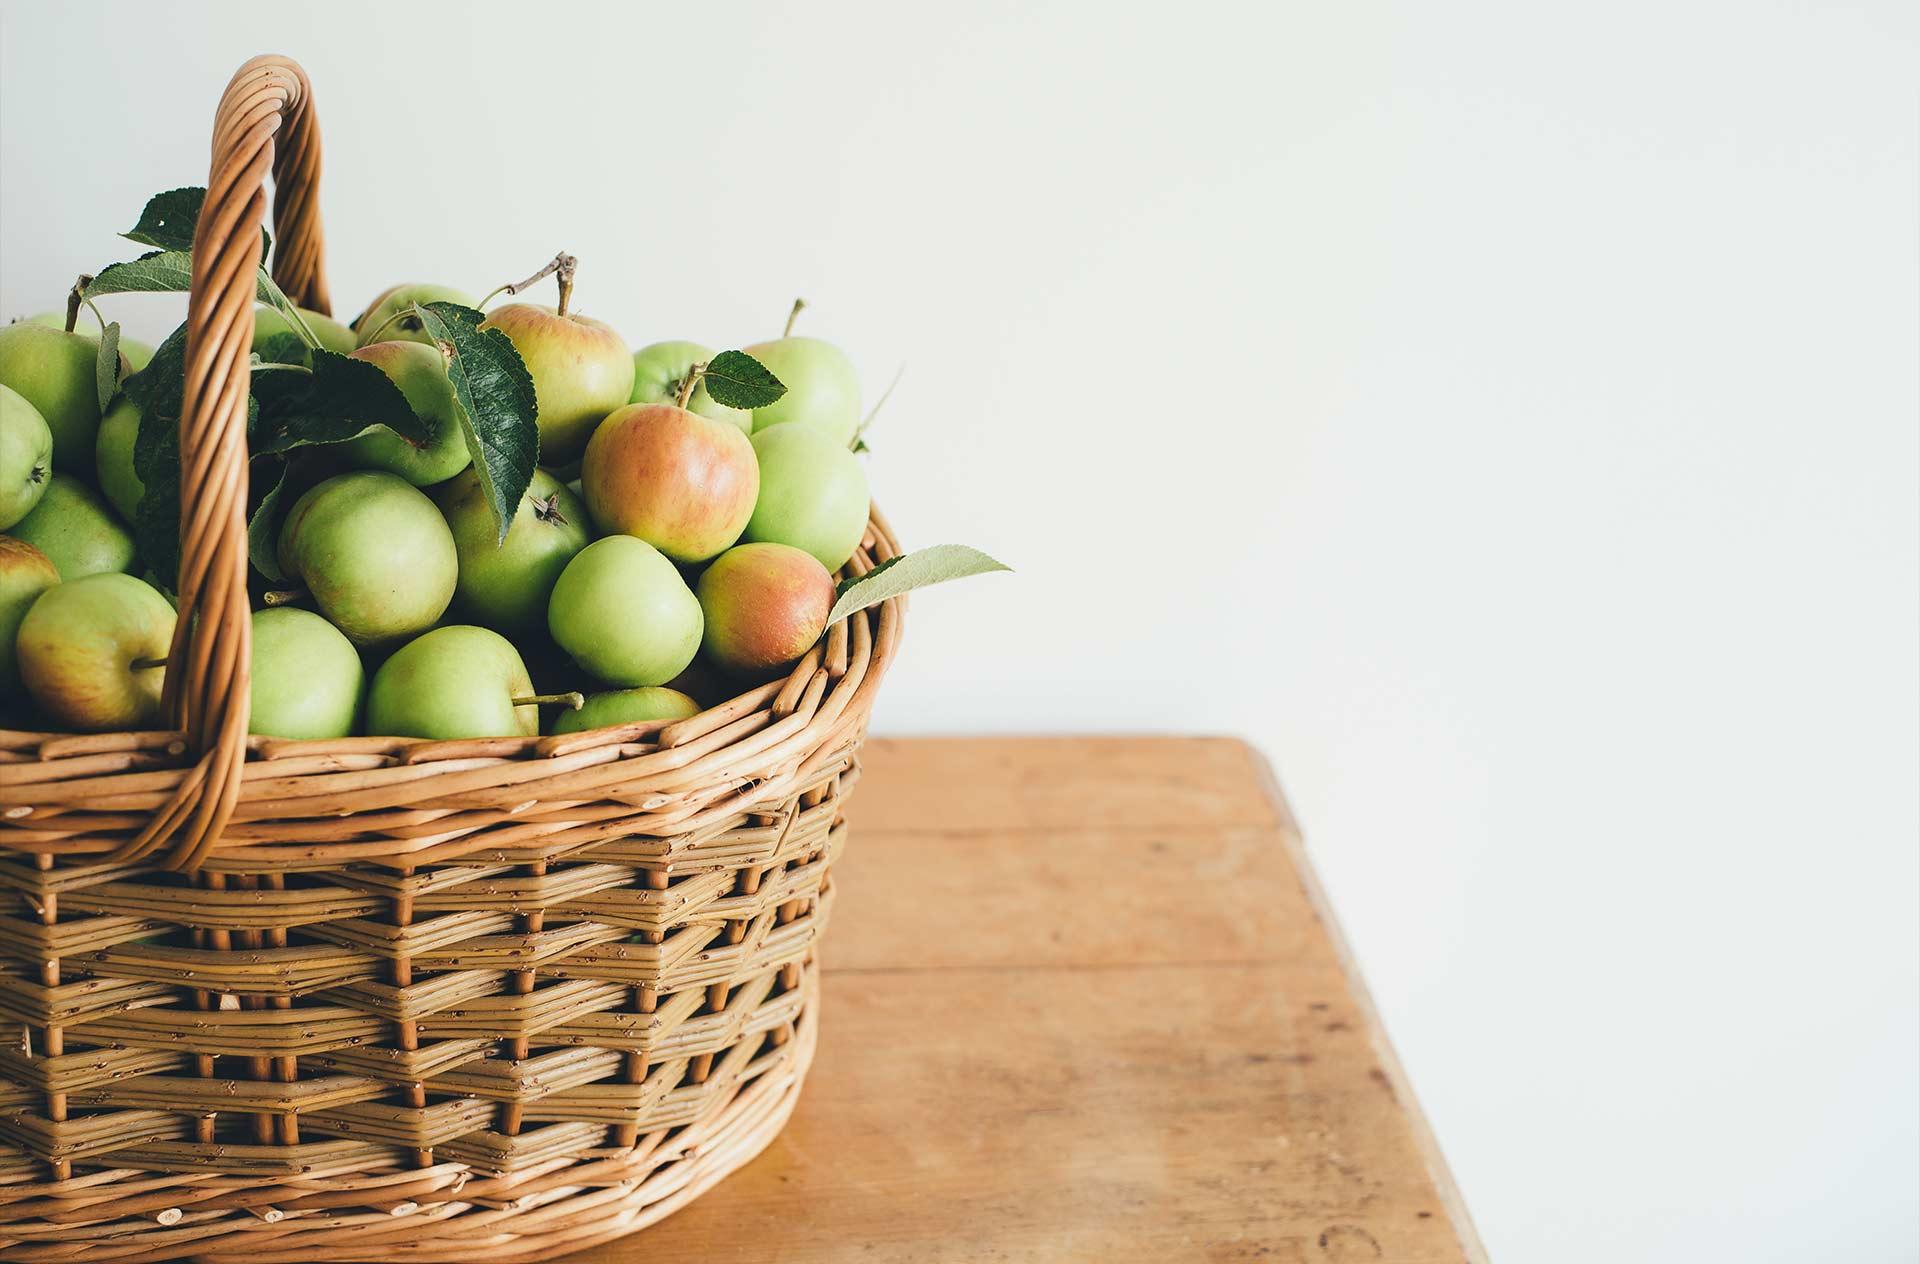 Les producteurs de Fruit de Felpi